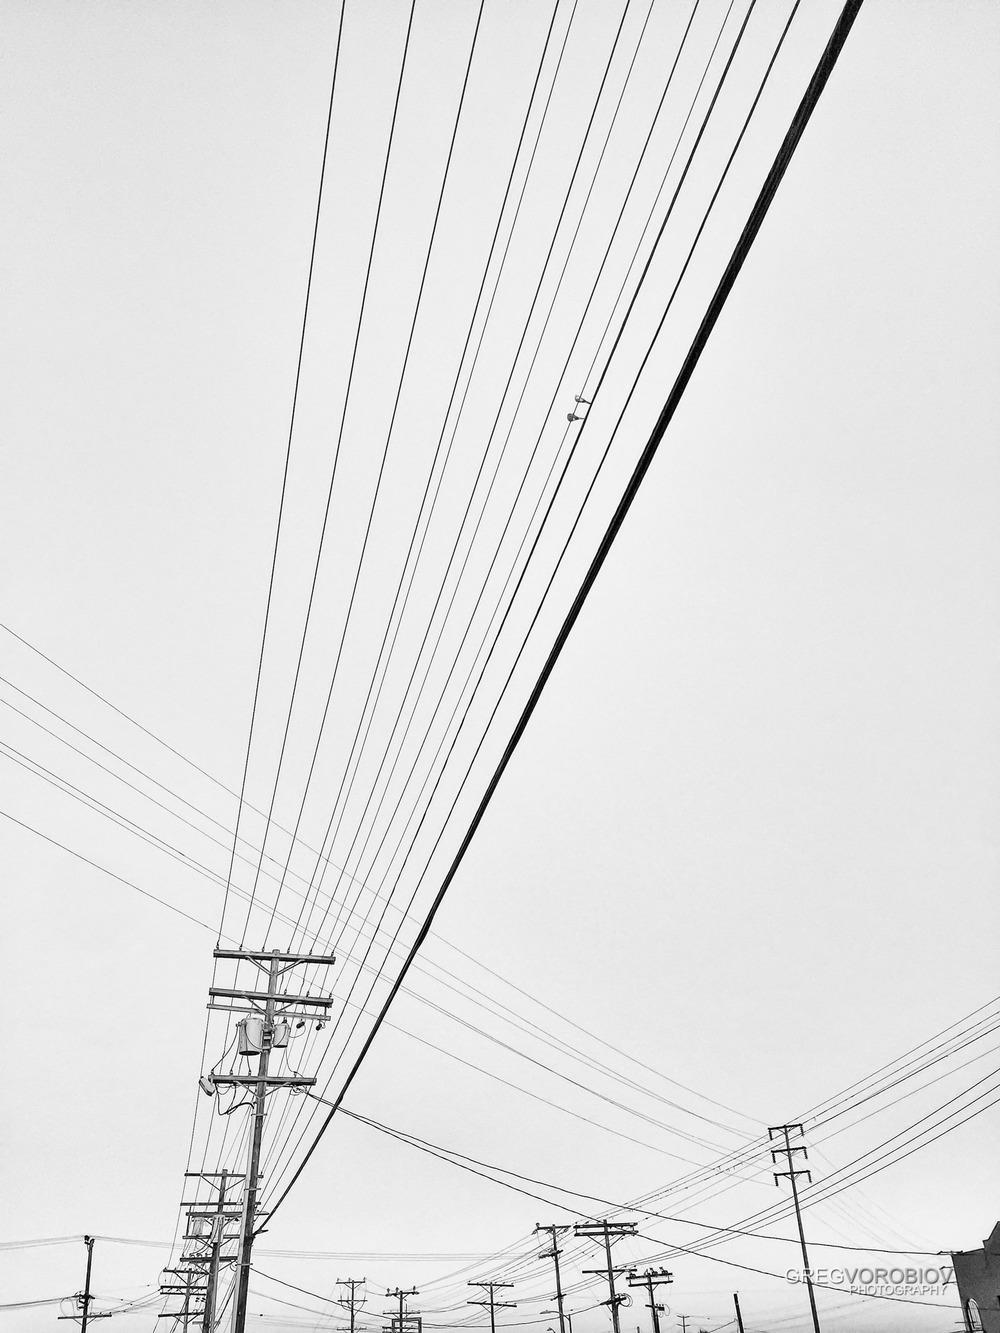 morning_dove_love_lines_by_greg_vorobiov-1.jpg